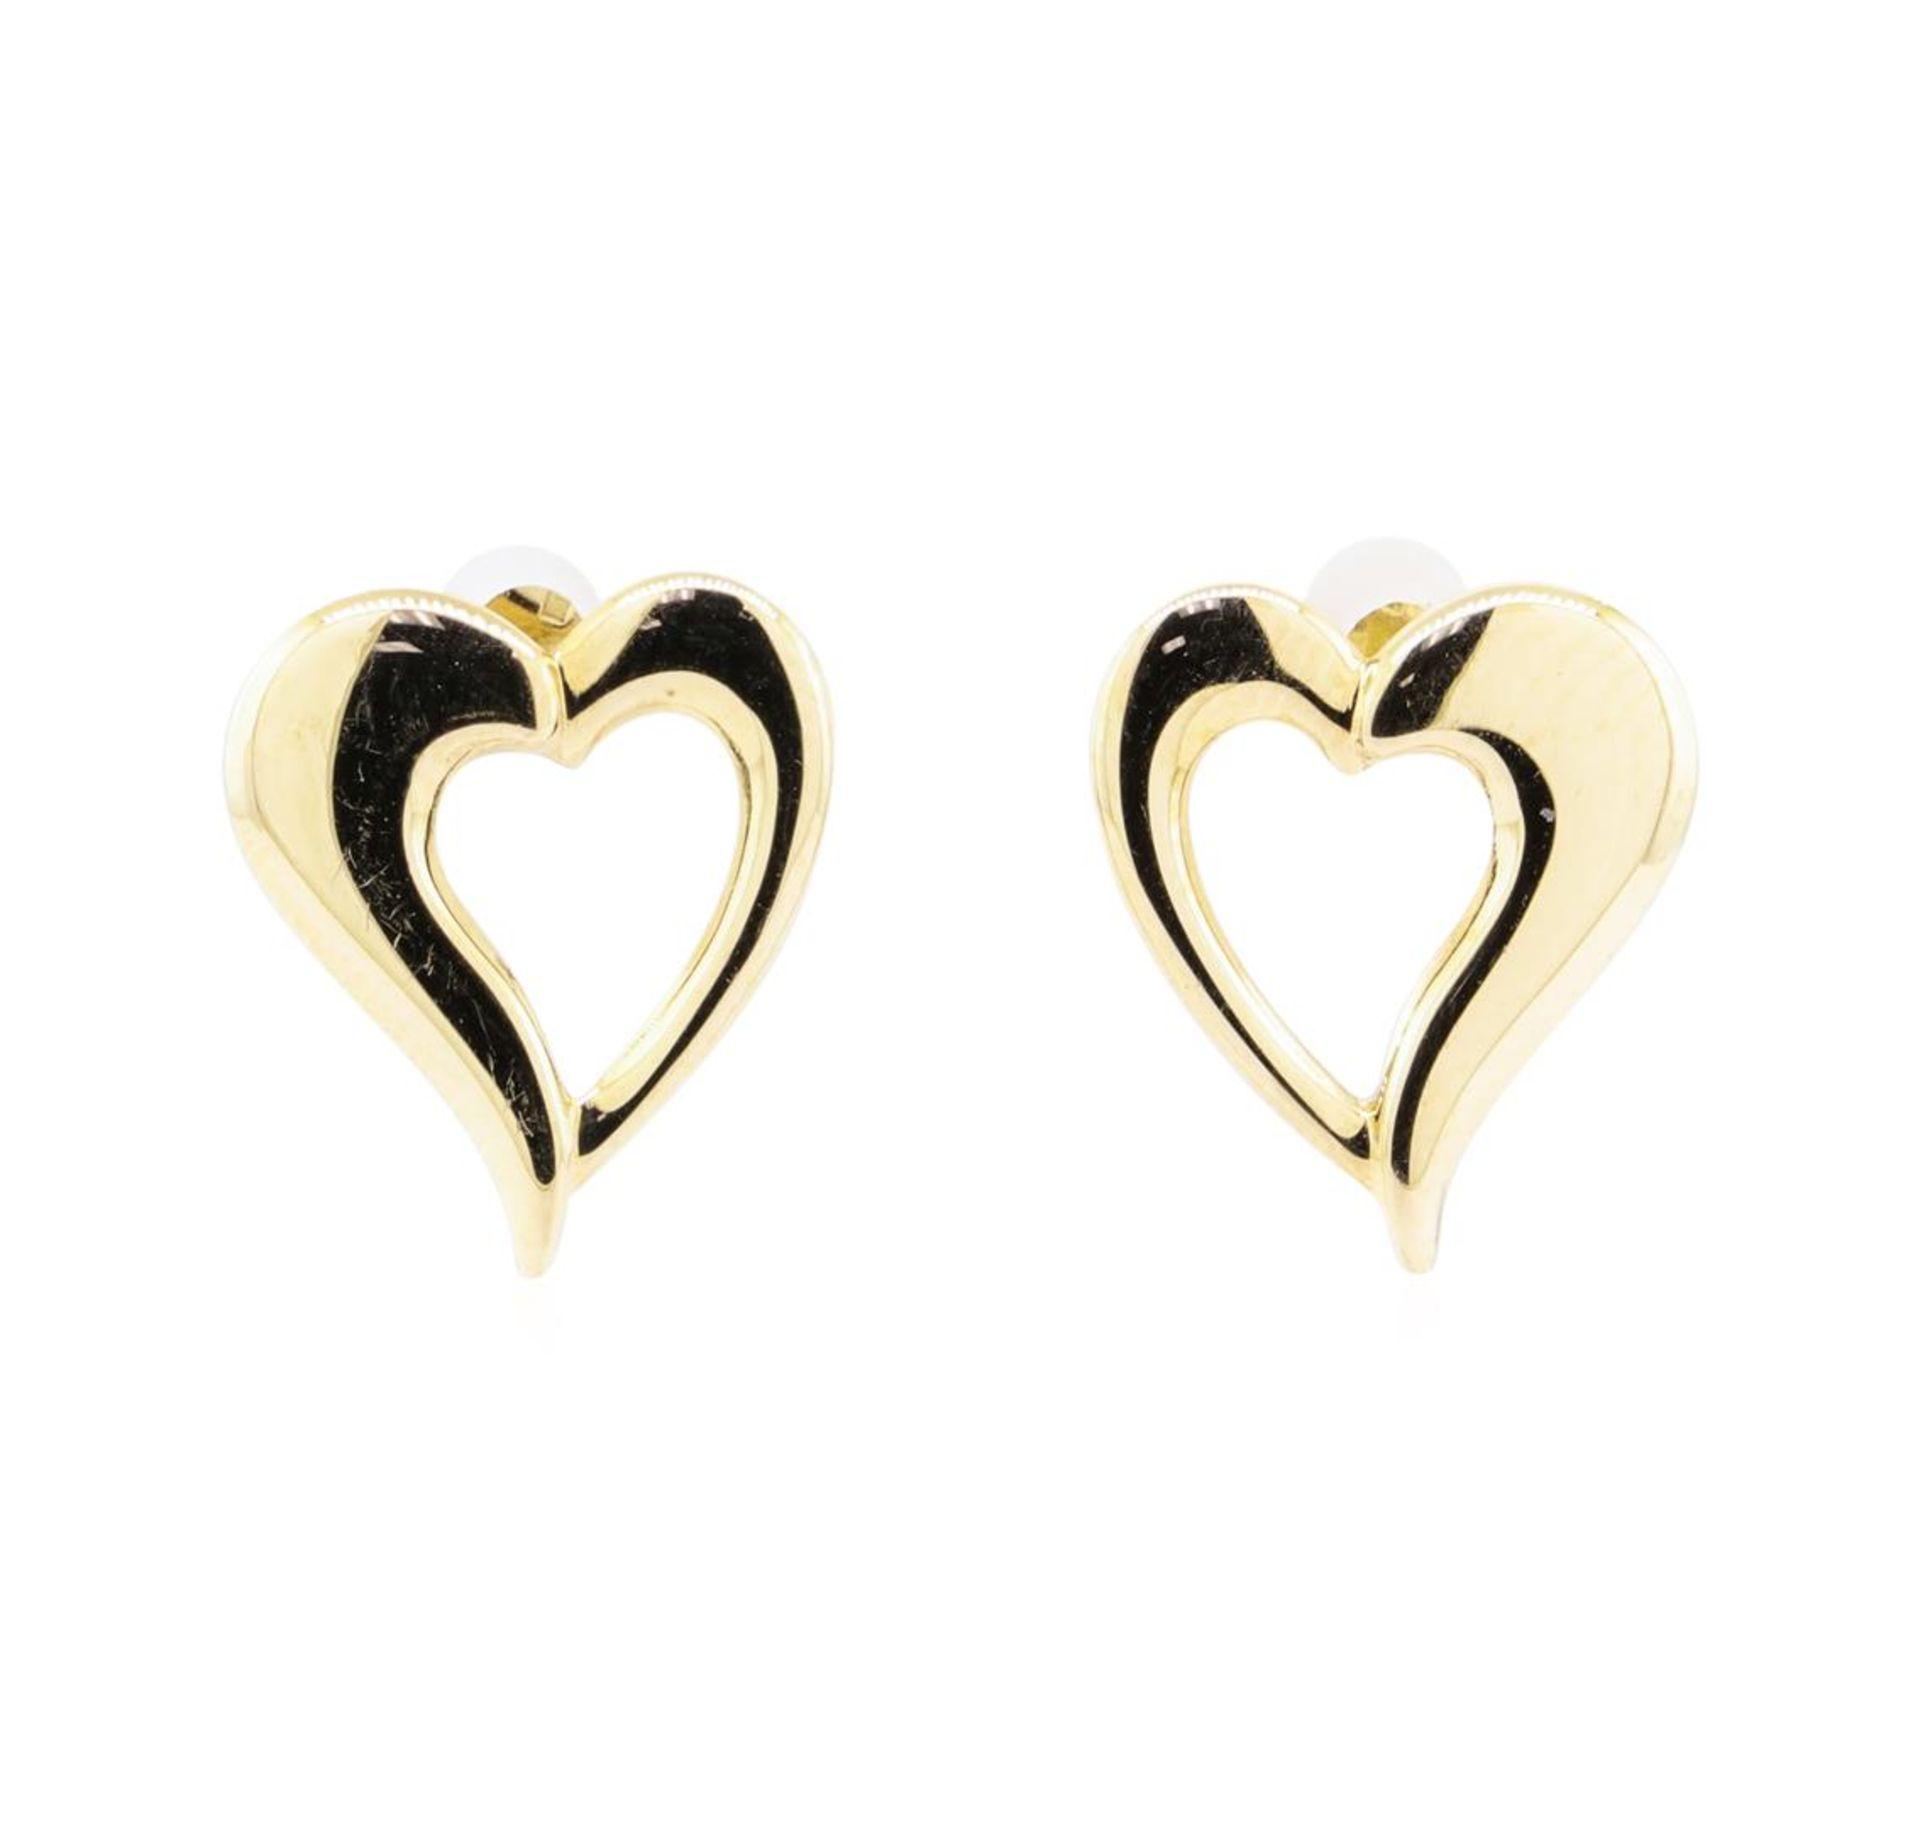 Puffed Heart Earrings - 14KT Yellow Gold